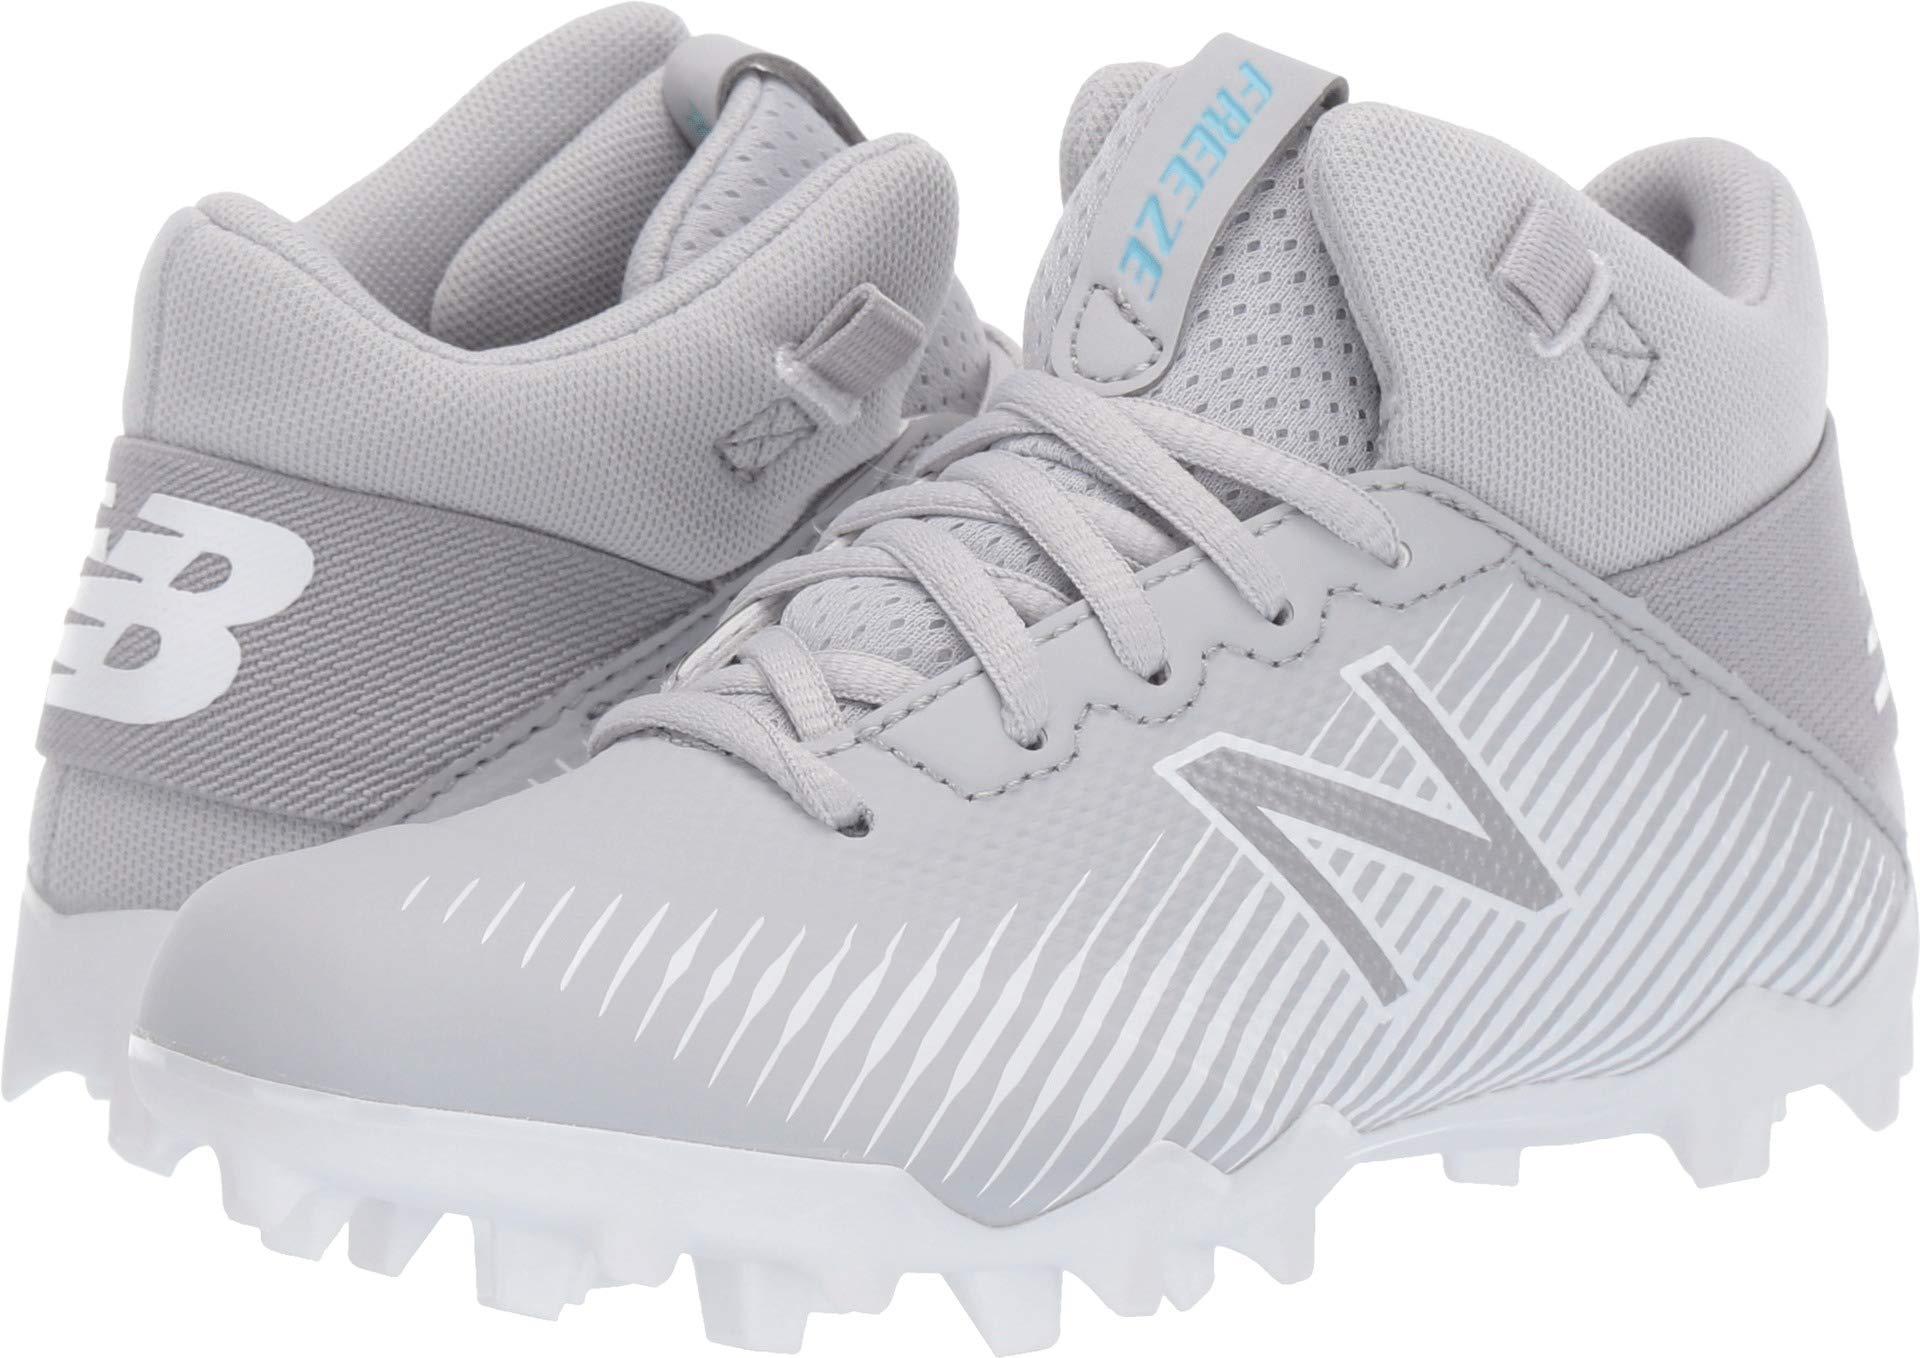 New Balance Boys' Freeze V2 Agility Lacrosse Shoe, Grey/White, 3 W US Little Kid